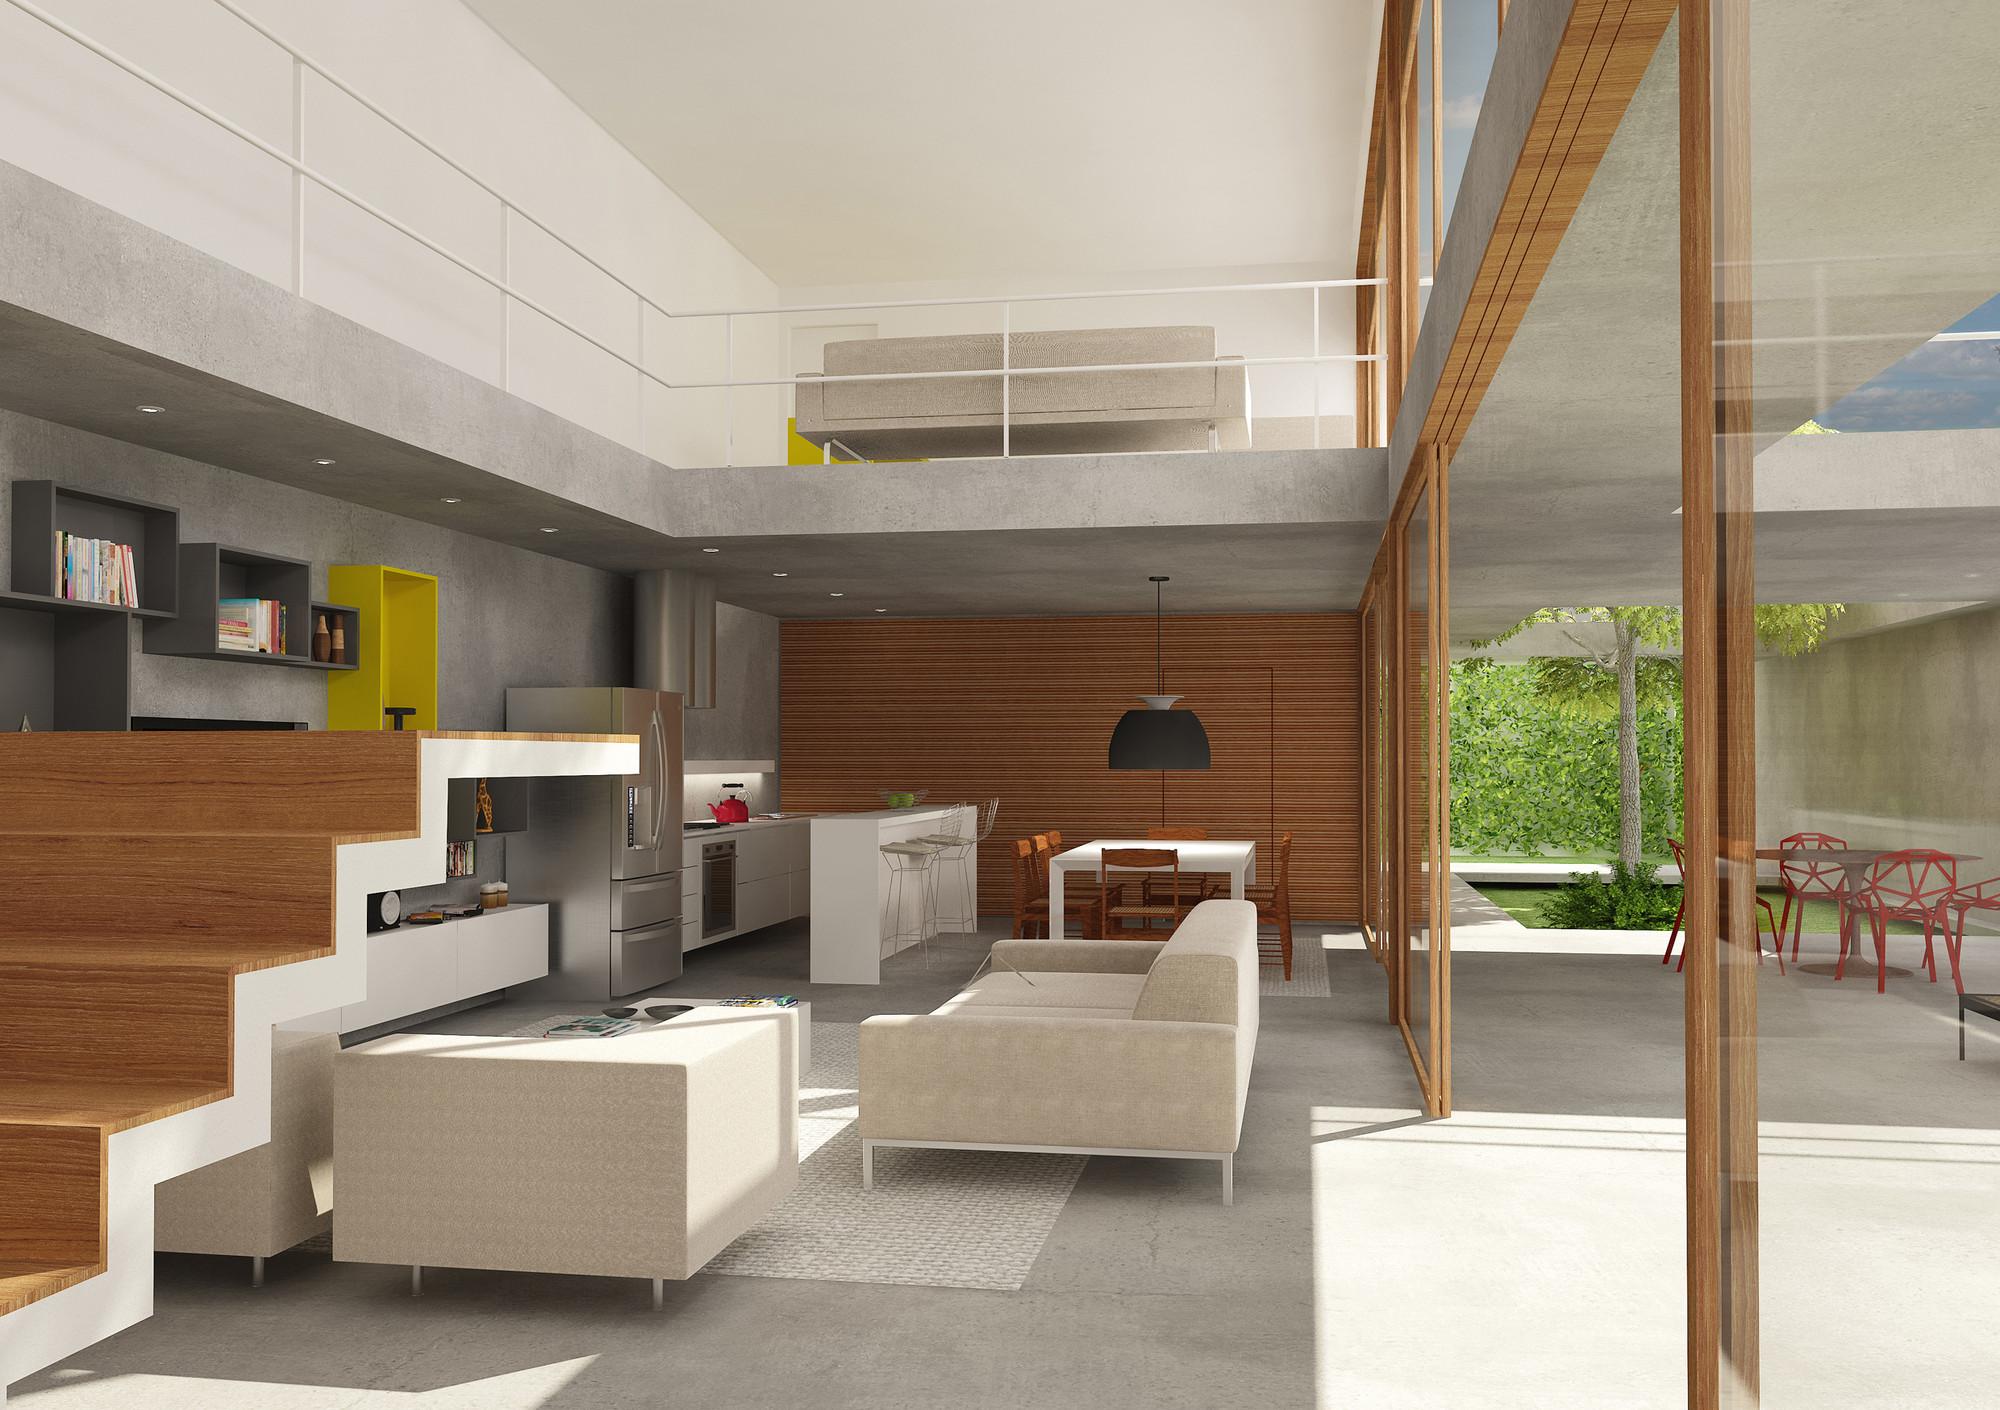 Galeria casa 10x38 cr2 arquitetura 3 for Dormitorio 2 50 x 2 50